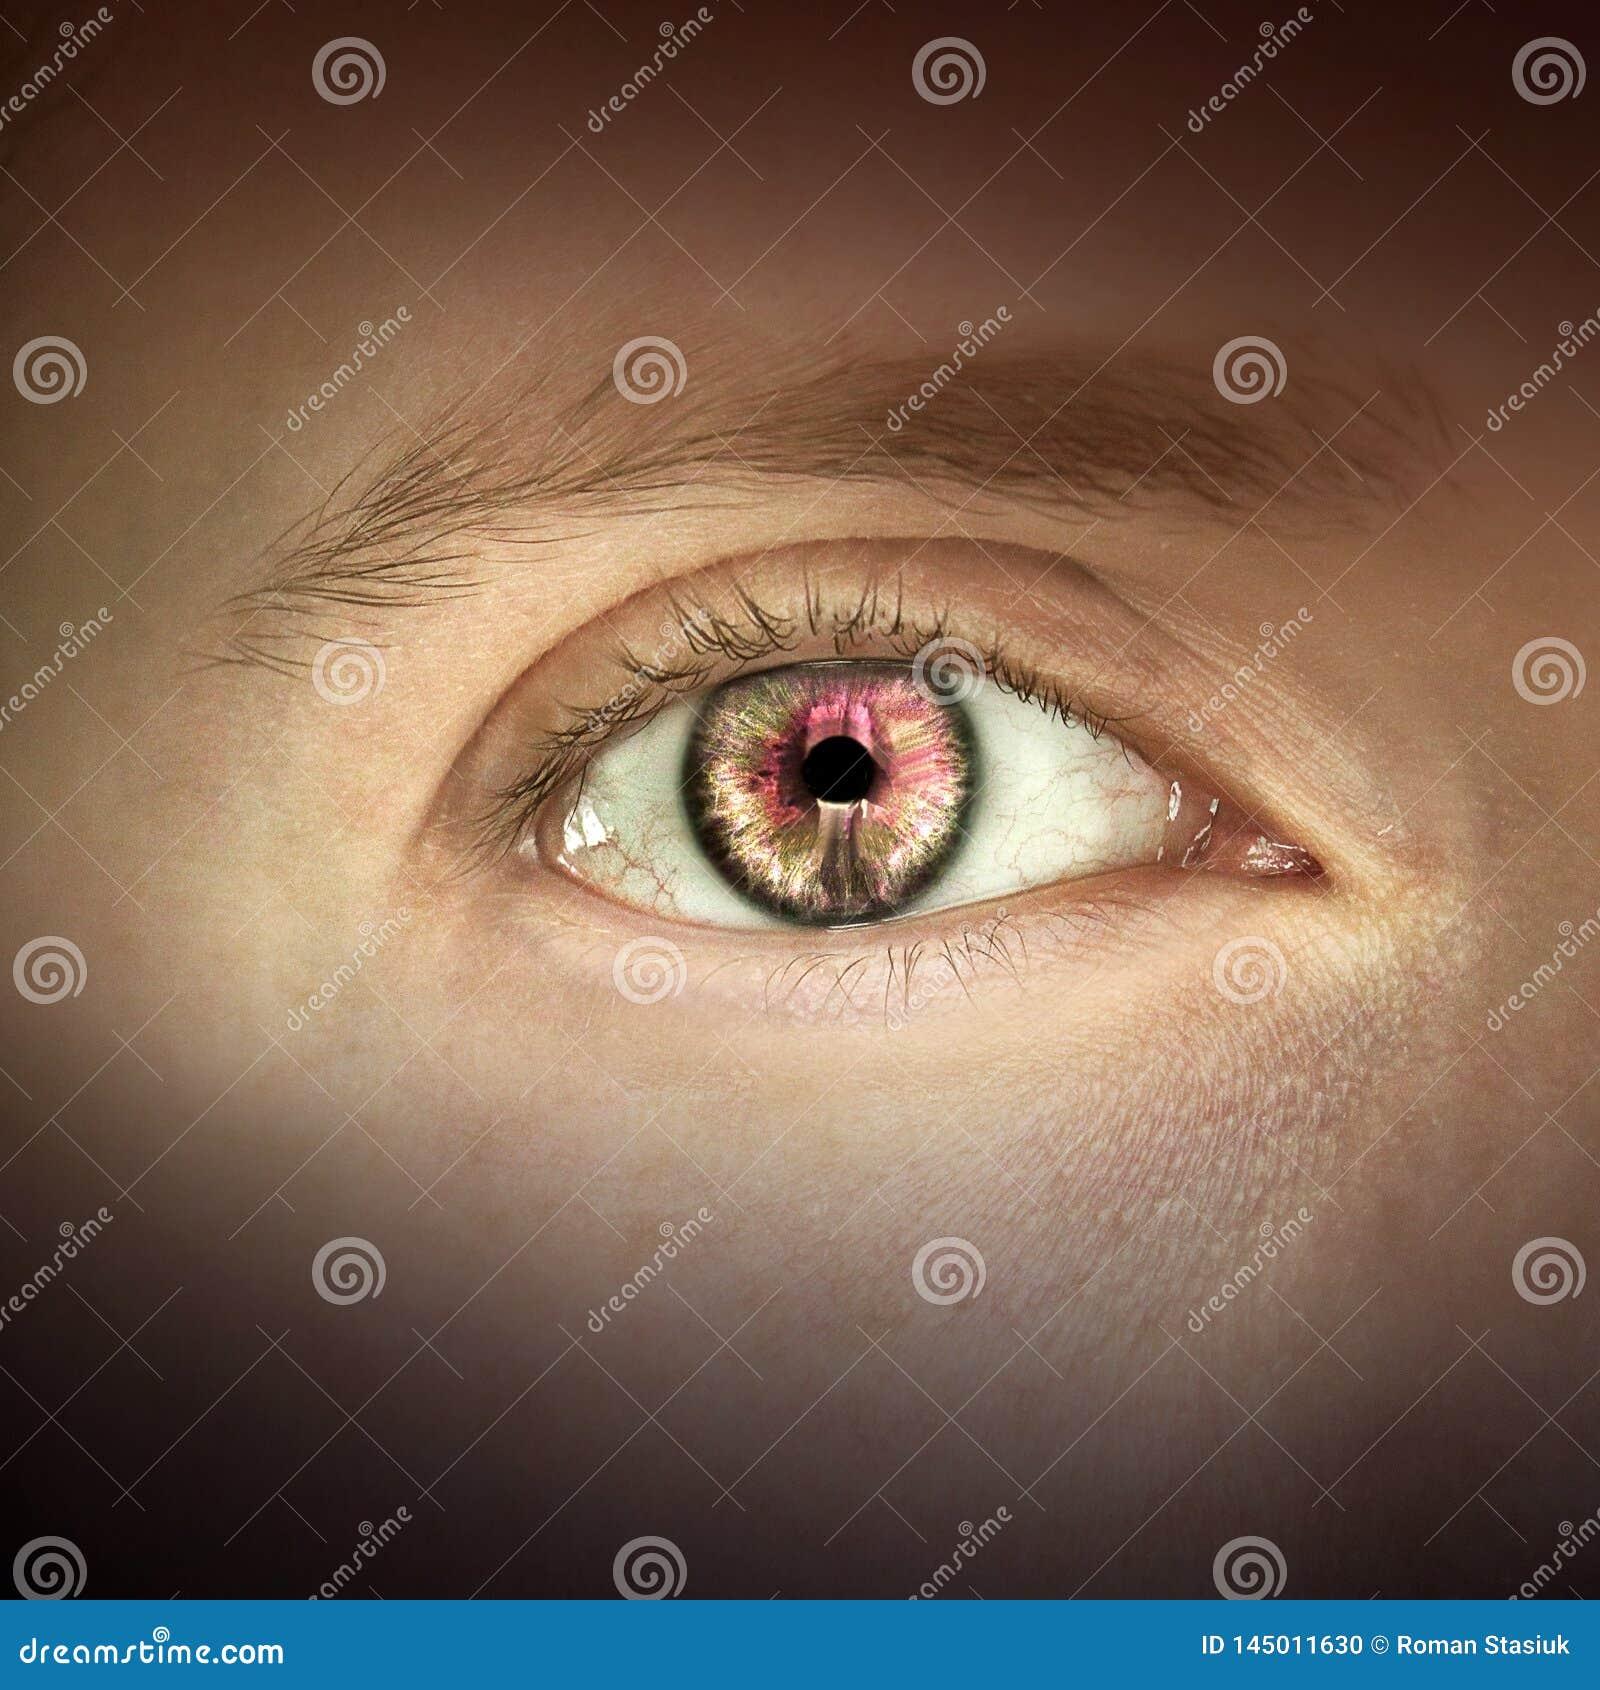 Imagen macra del ojo humano